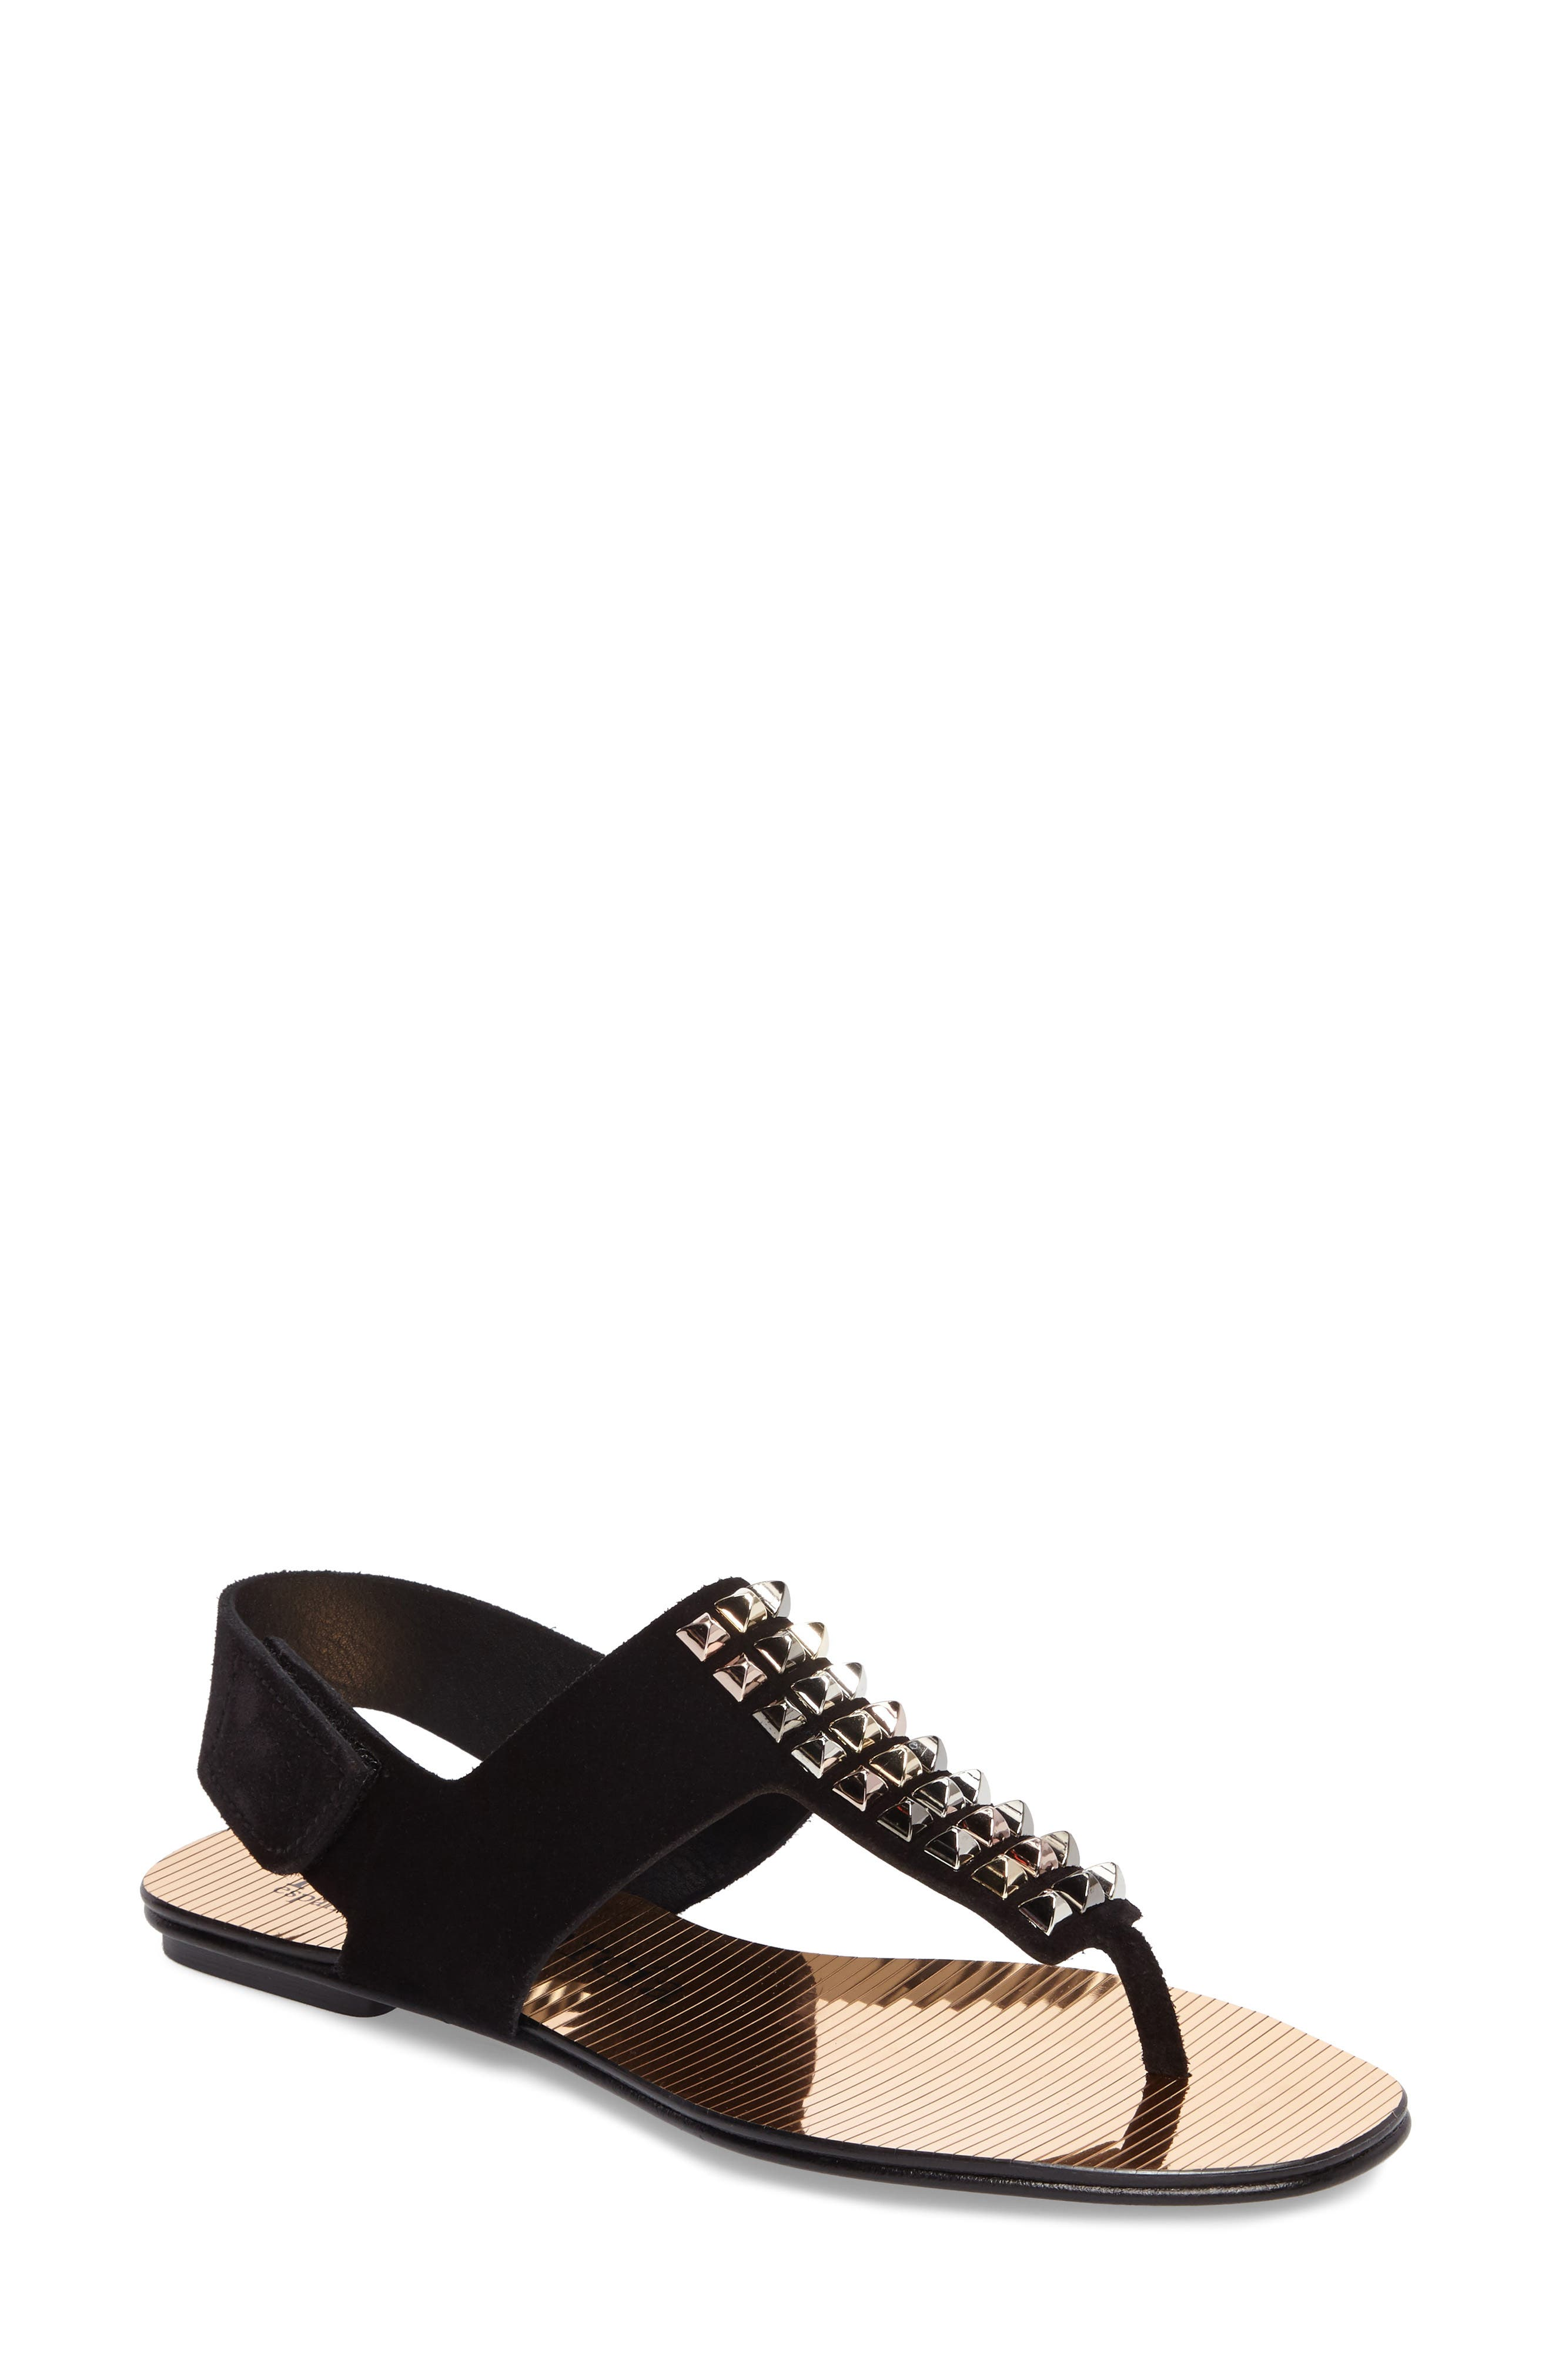 Main Image - Pedro Garcia Enid Studded T-Strap Sandal (Women)